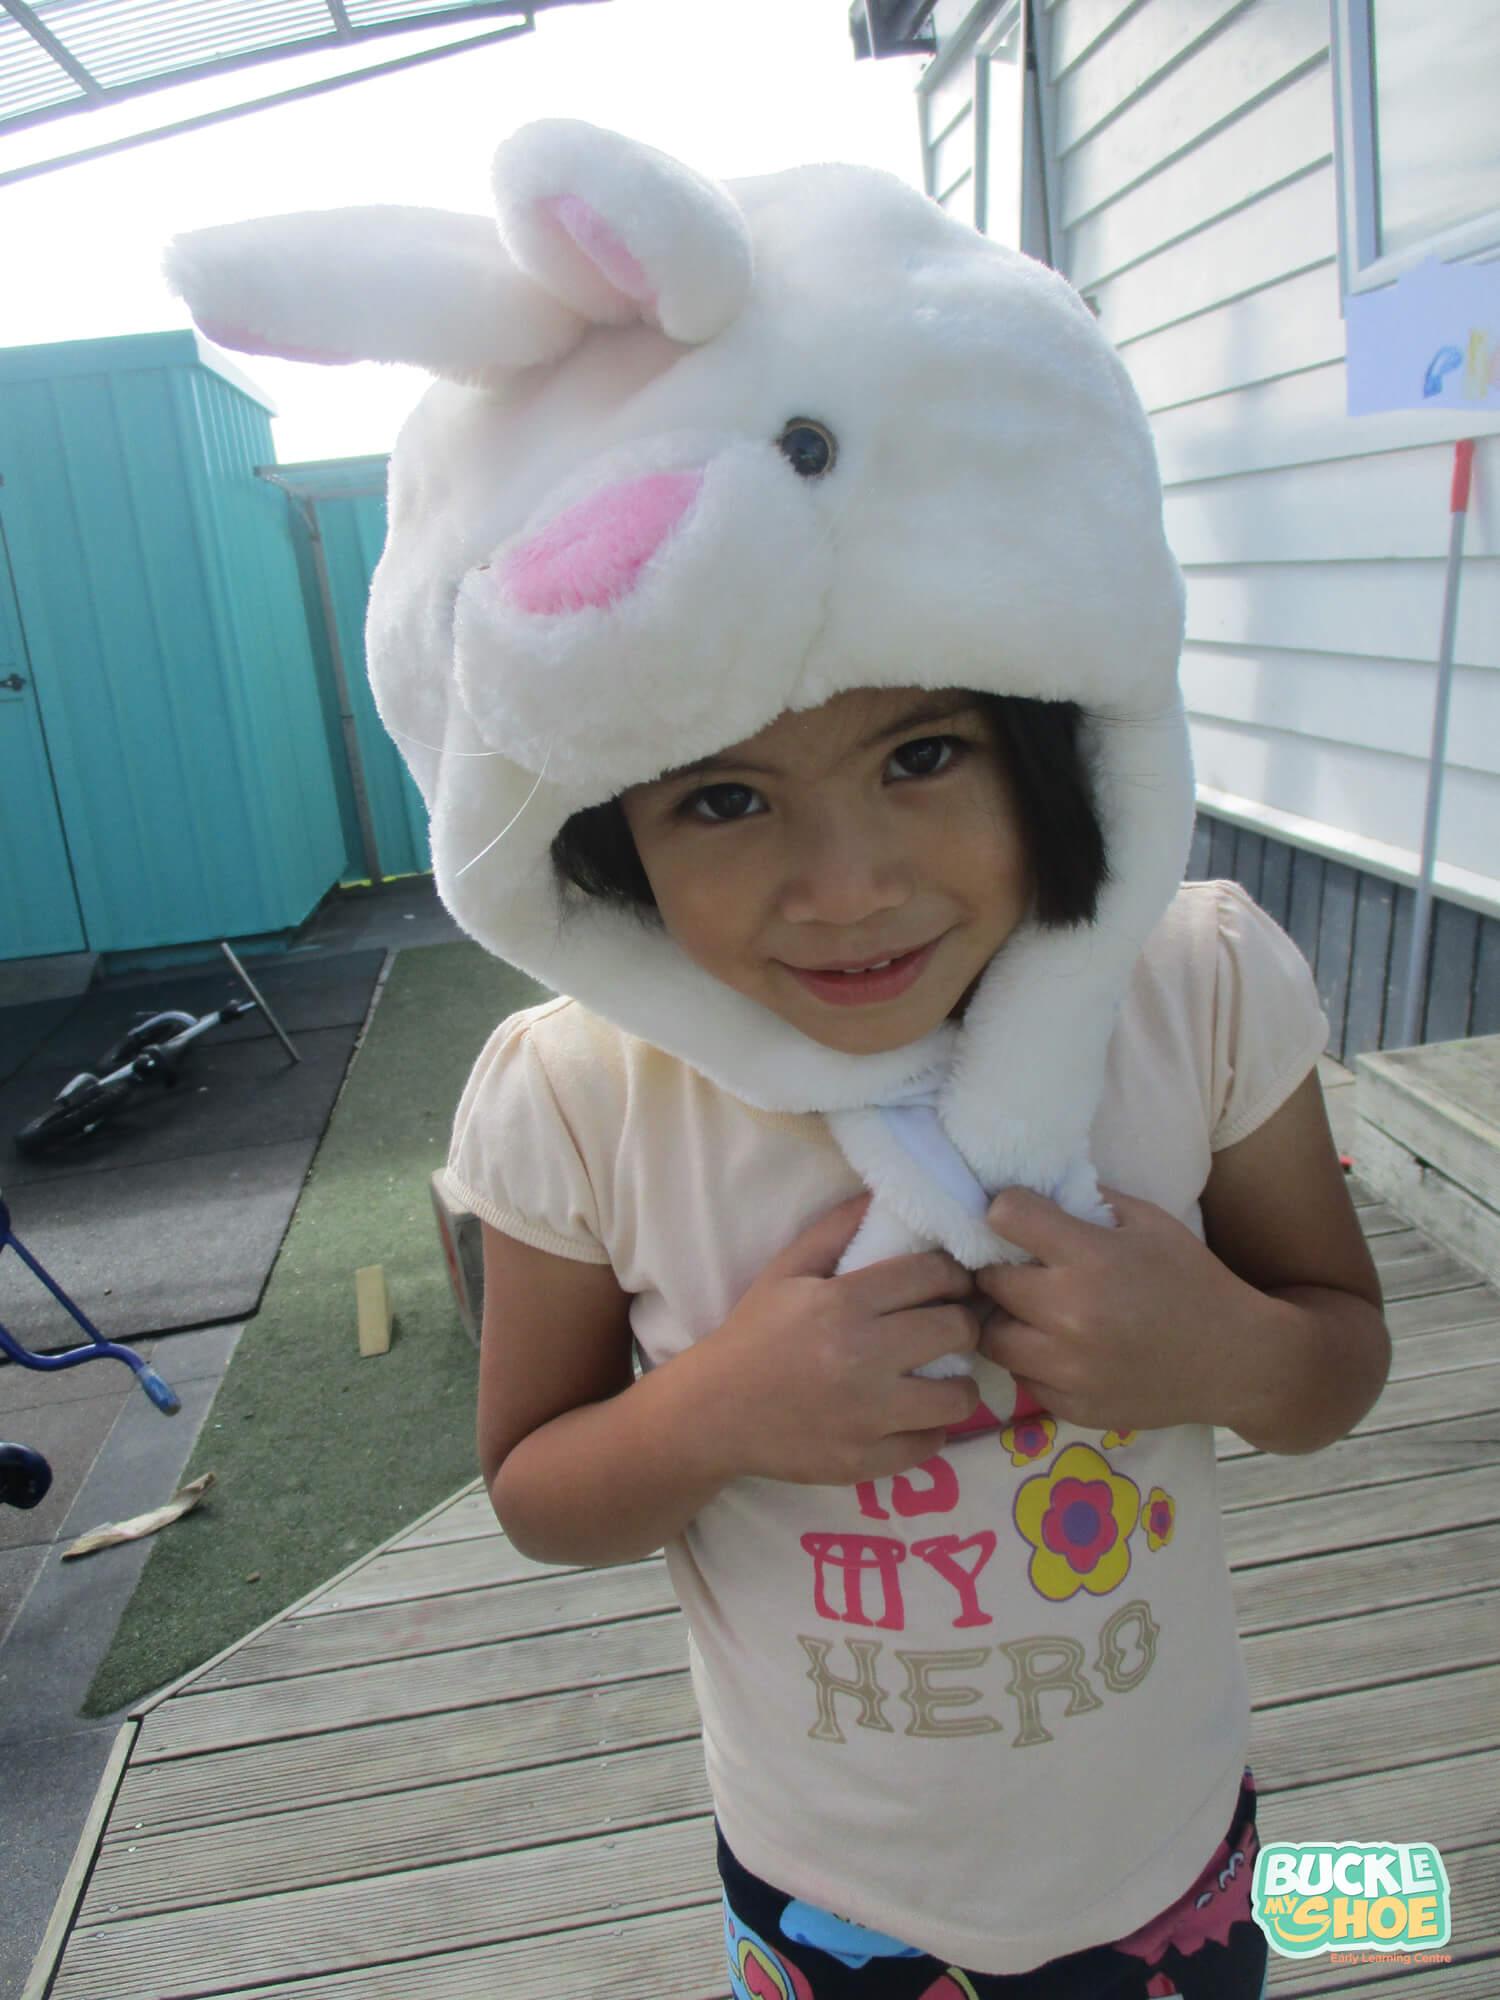 buckle-my-shoe-childcare-tauranga-easter-bunny.jpg